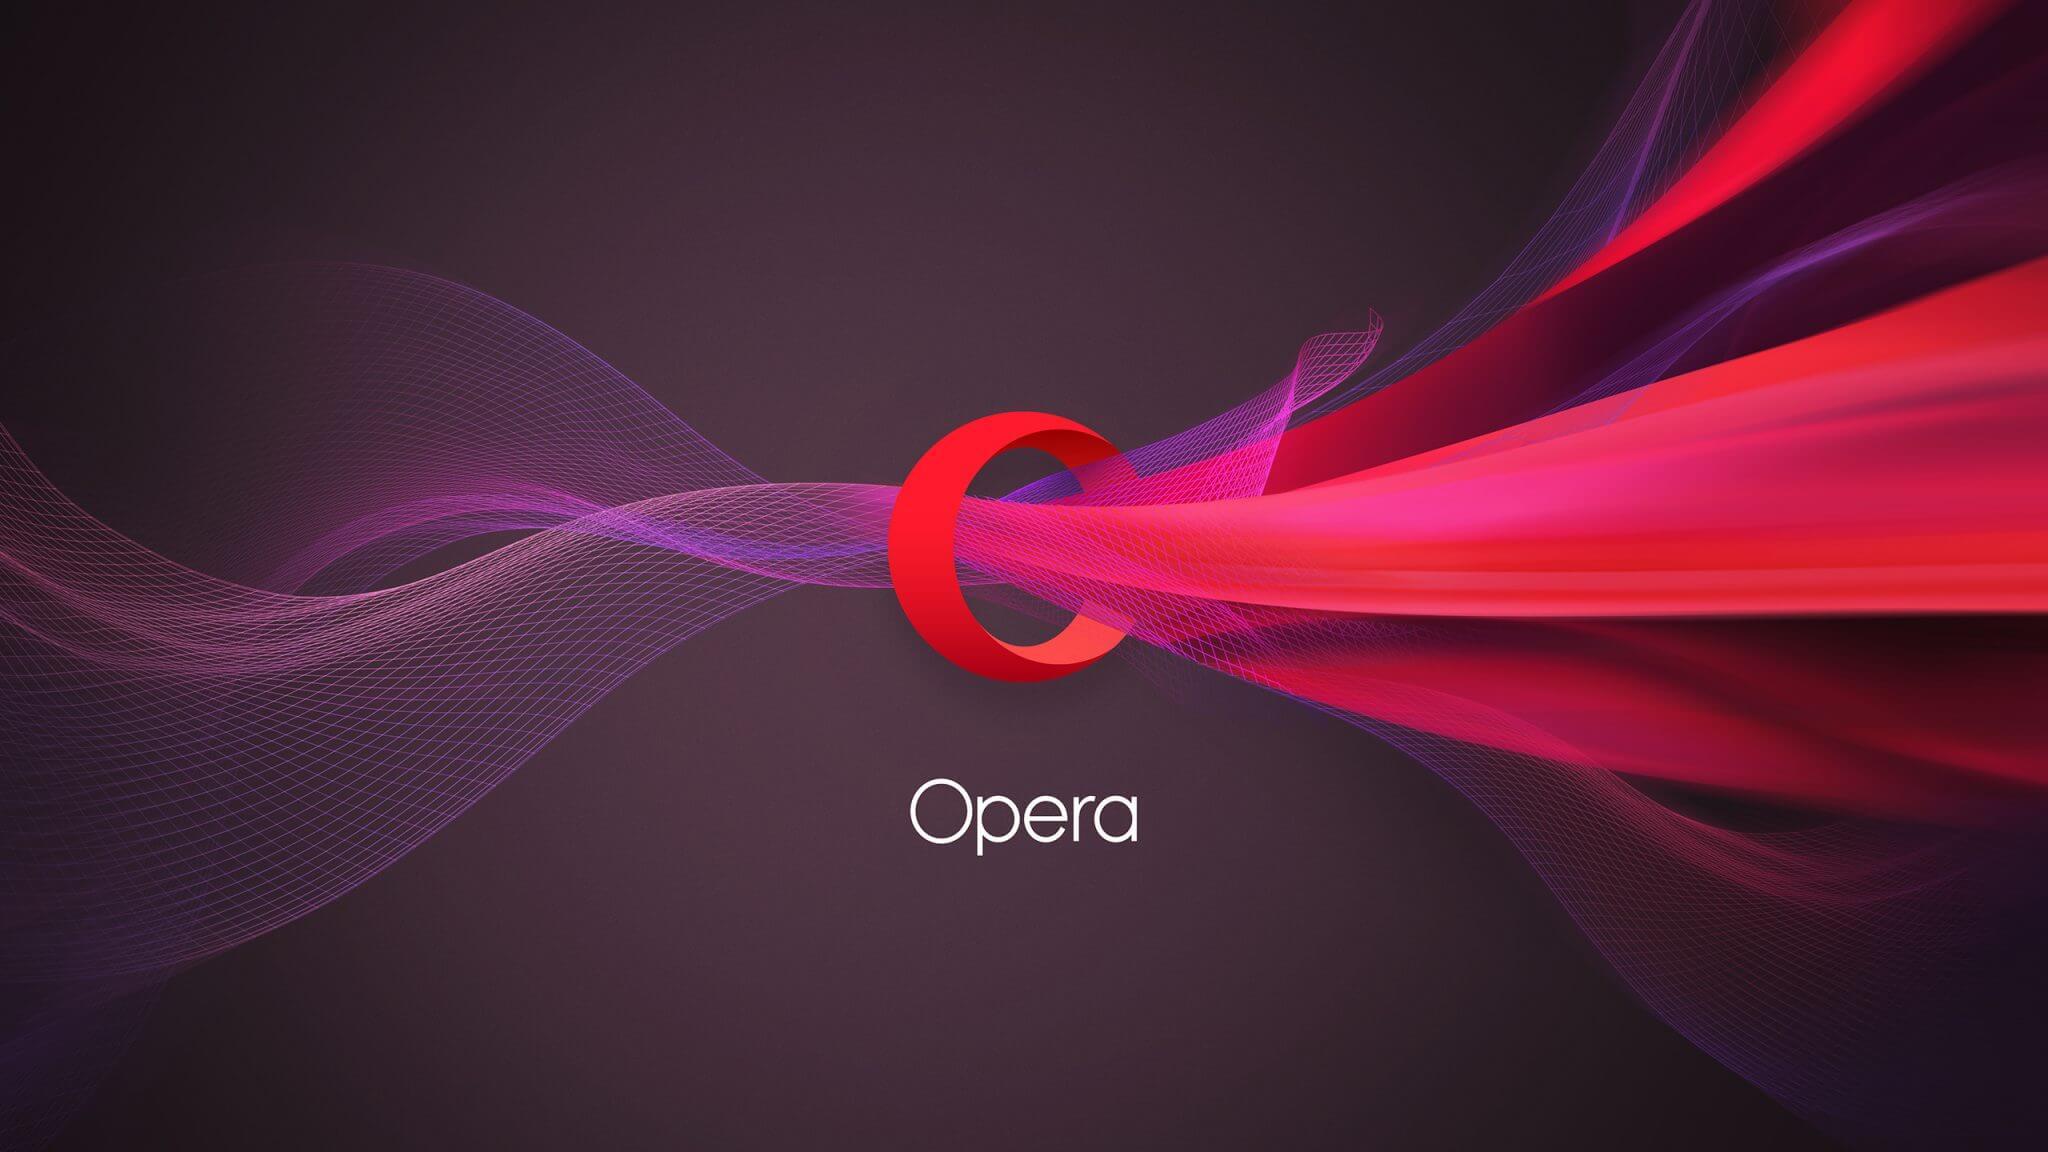 Navegador Opera agora tem VPN gratuita e ilimitada